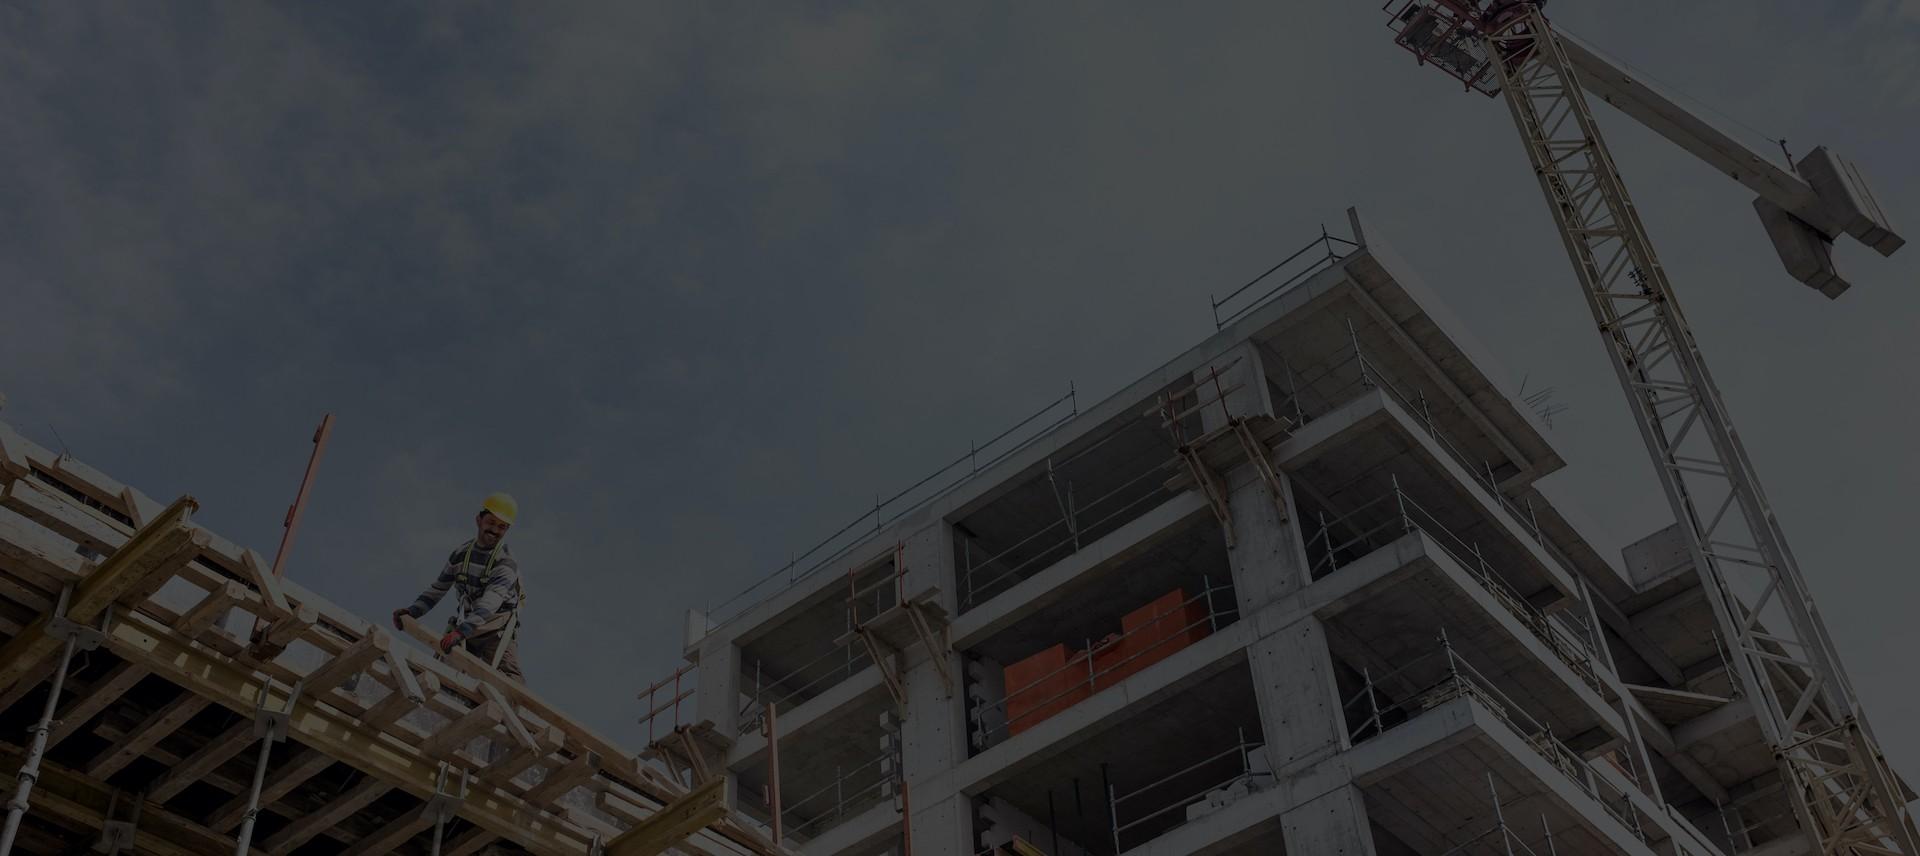 Algemene bouwonderneming